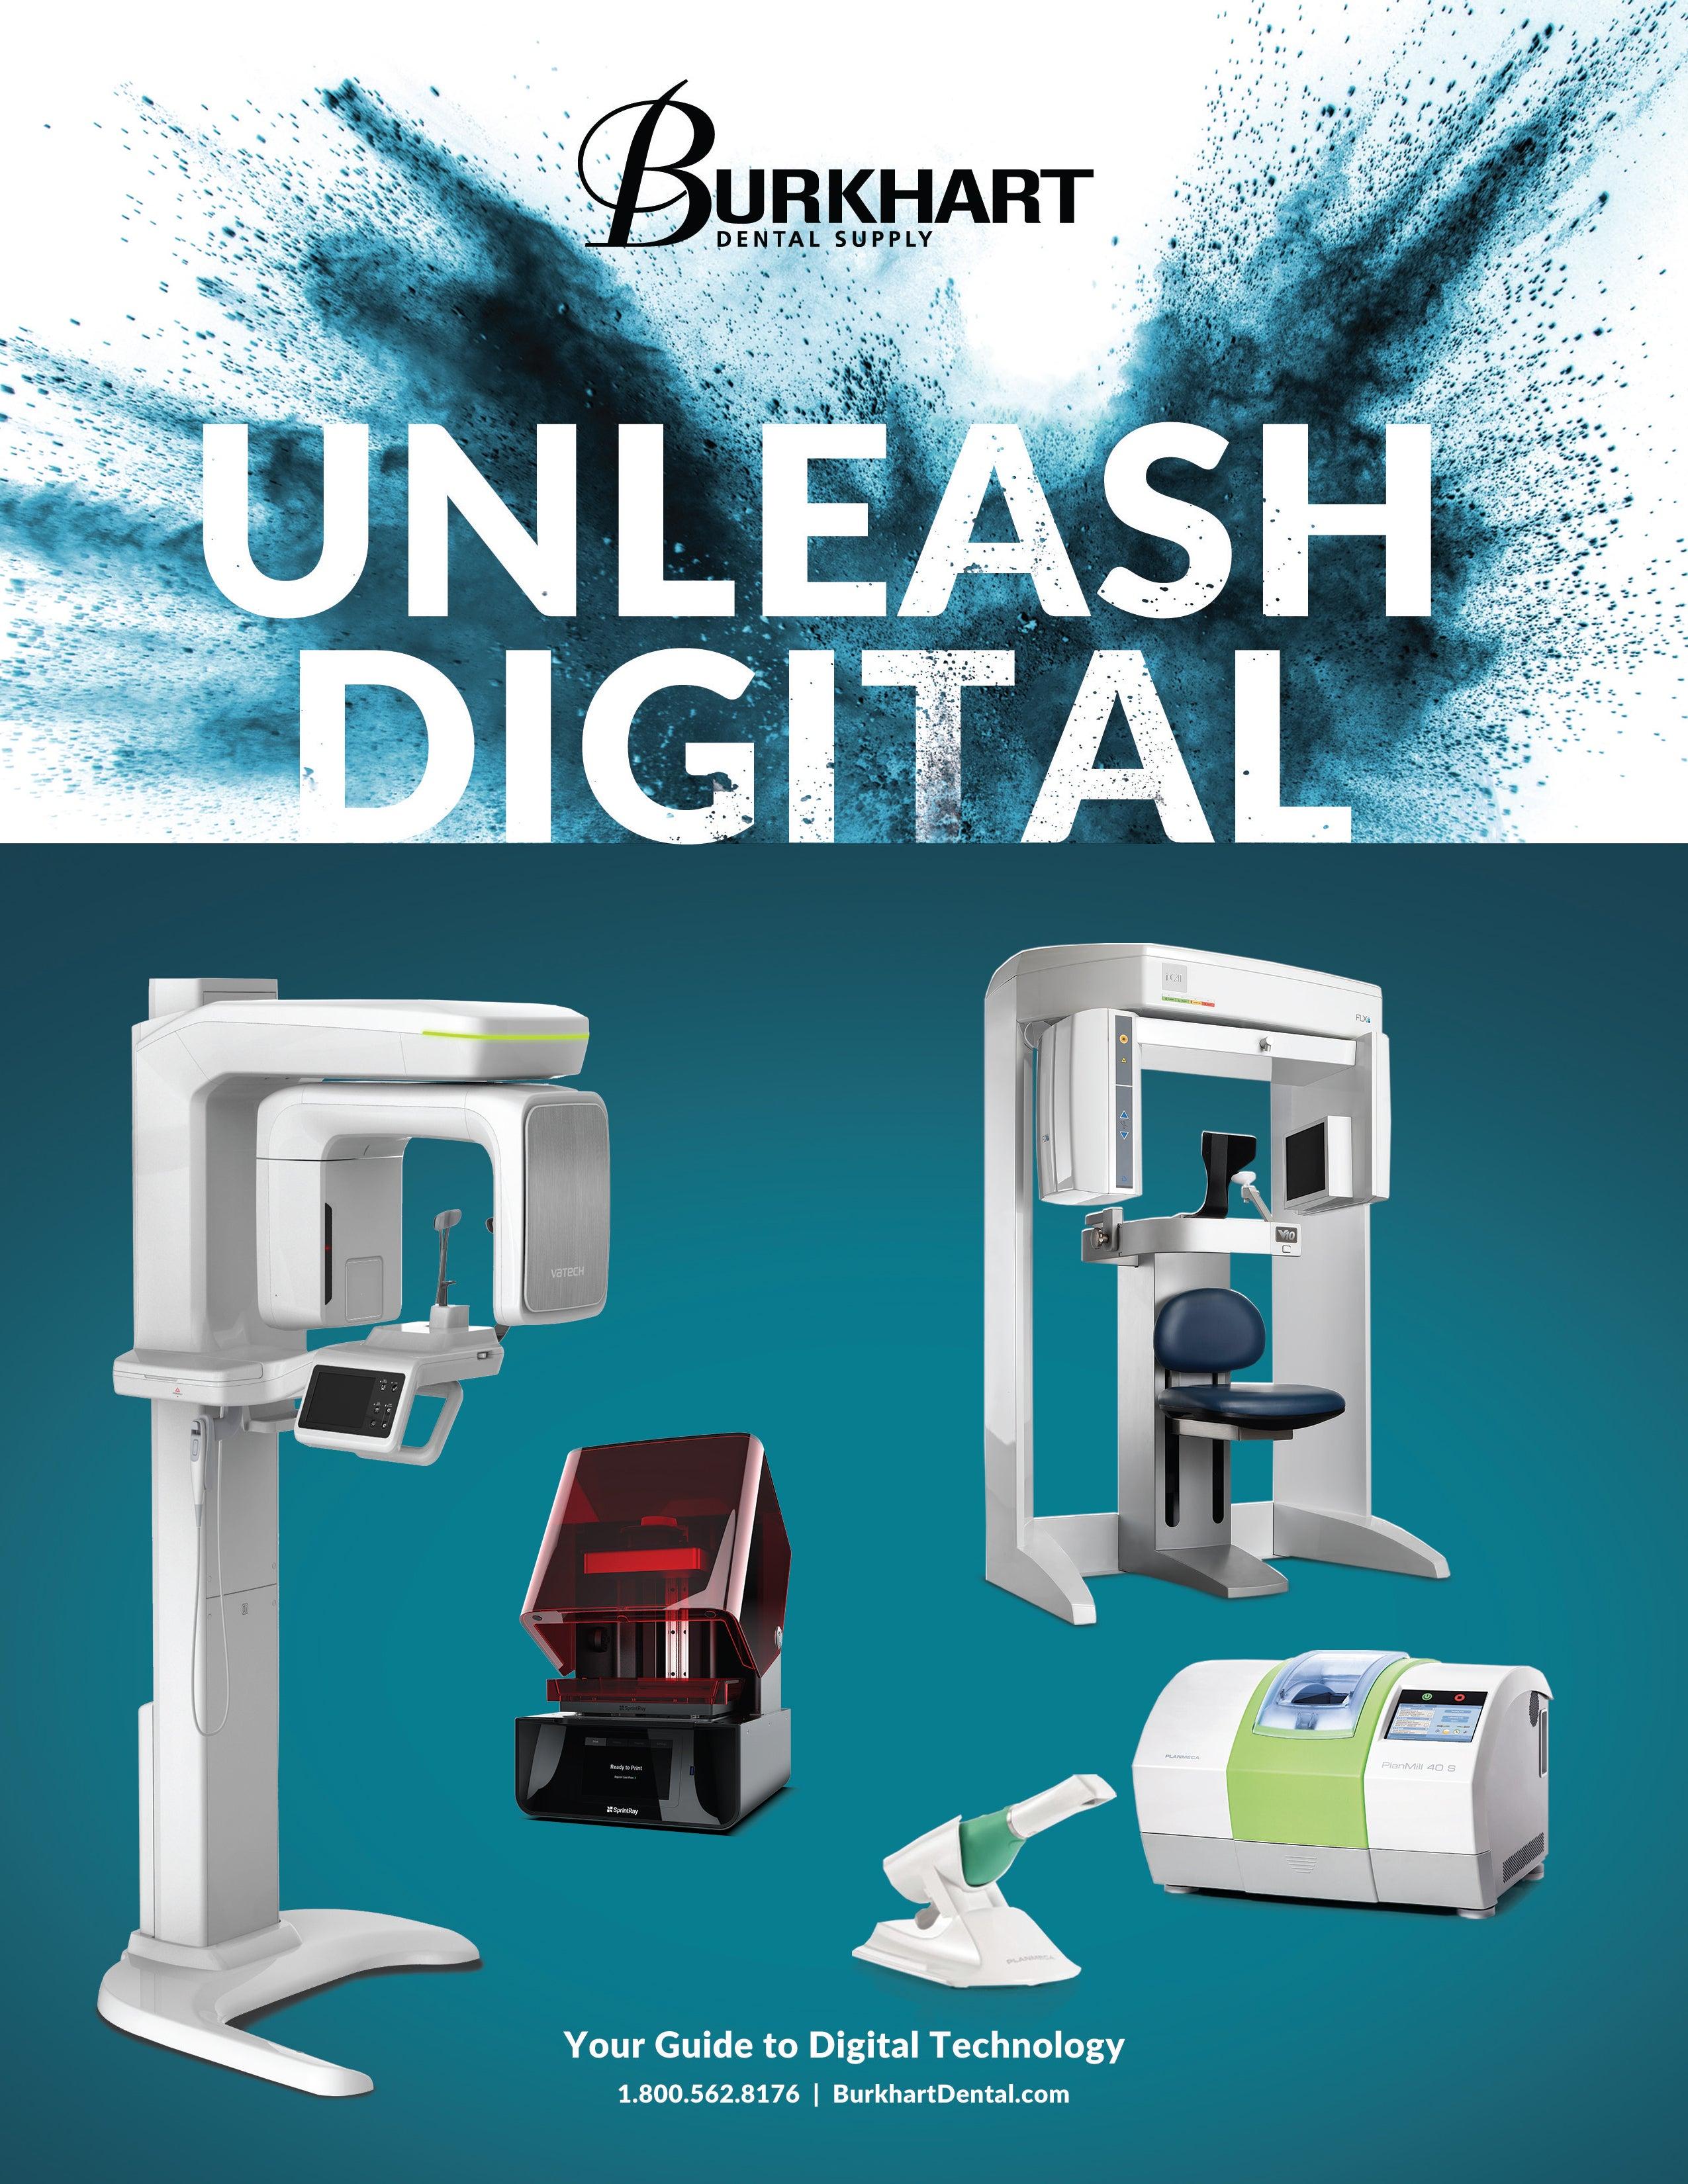 Digital Technology Guide 2019